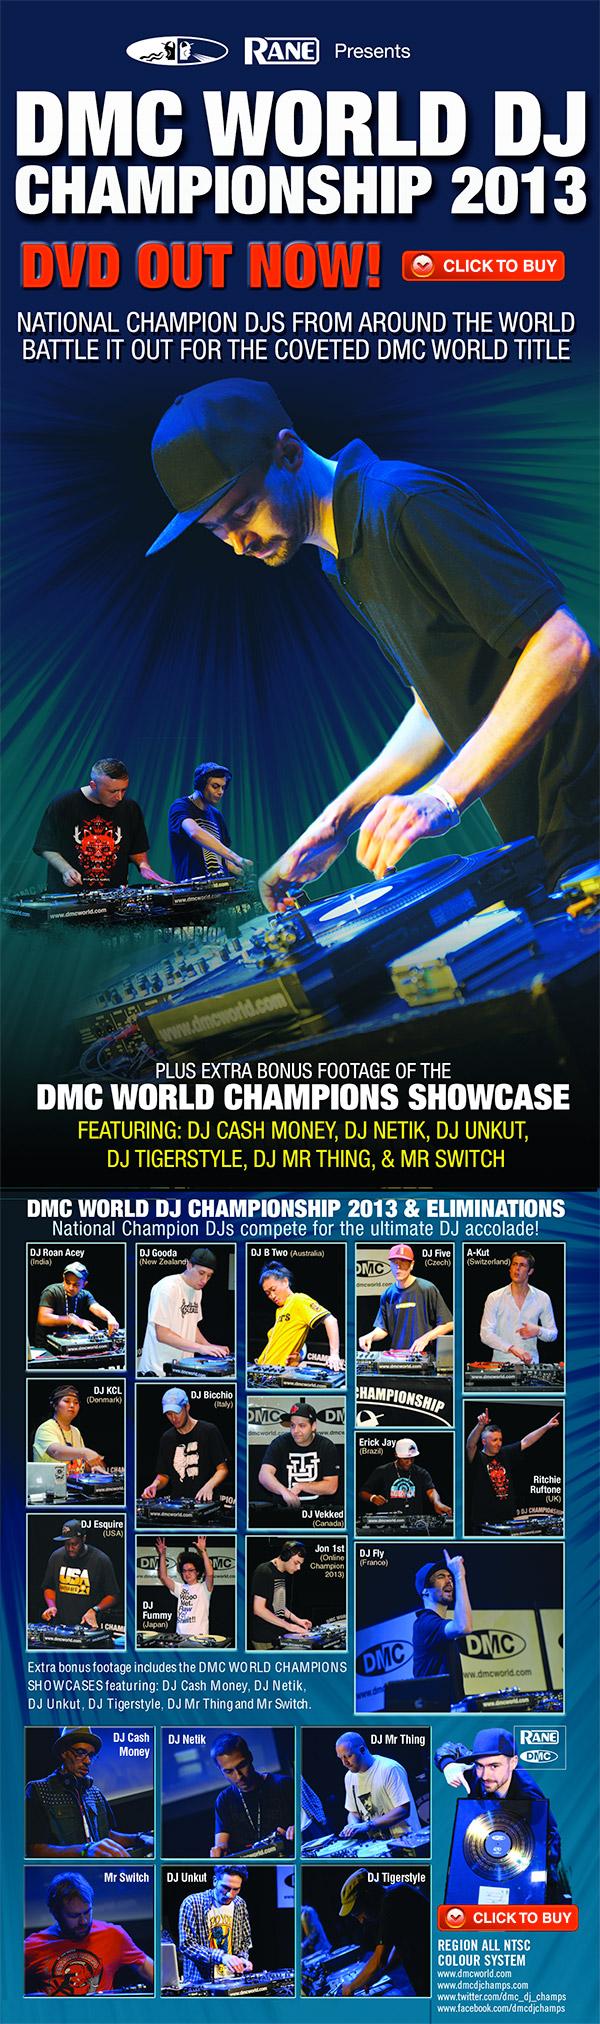 DVD Tipp: DMC World DJ Championship 2013 und World Eliminations